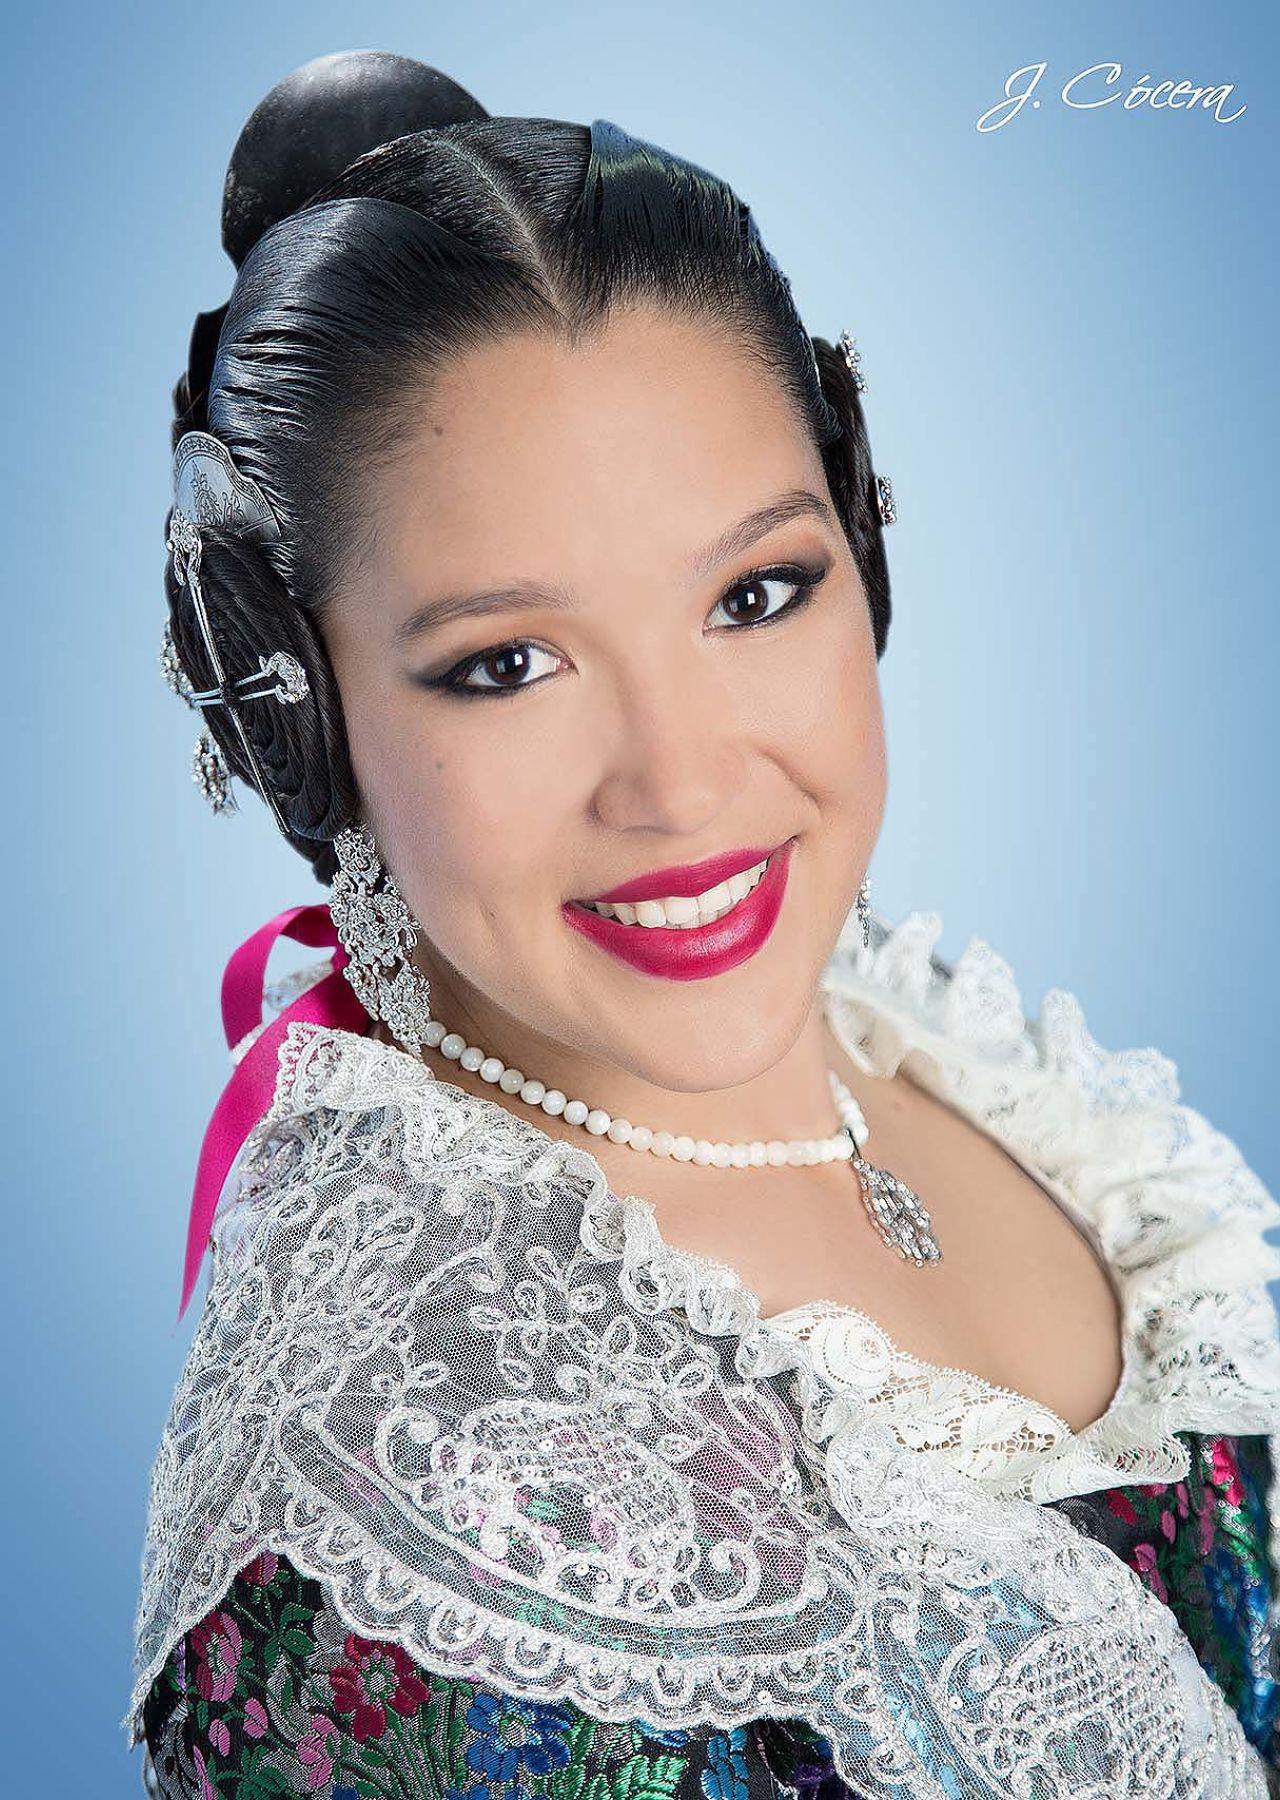 Alicia Saez Cutanda